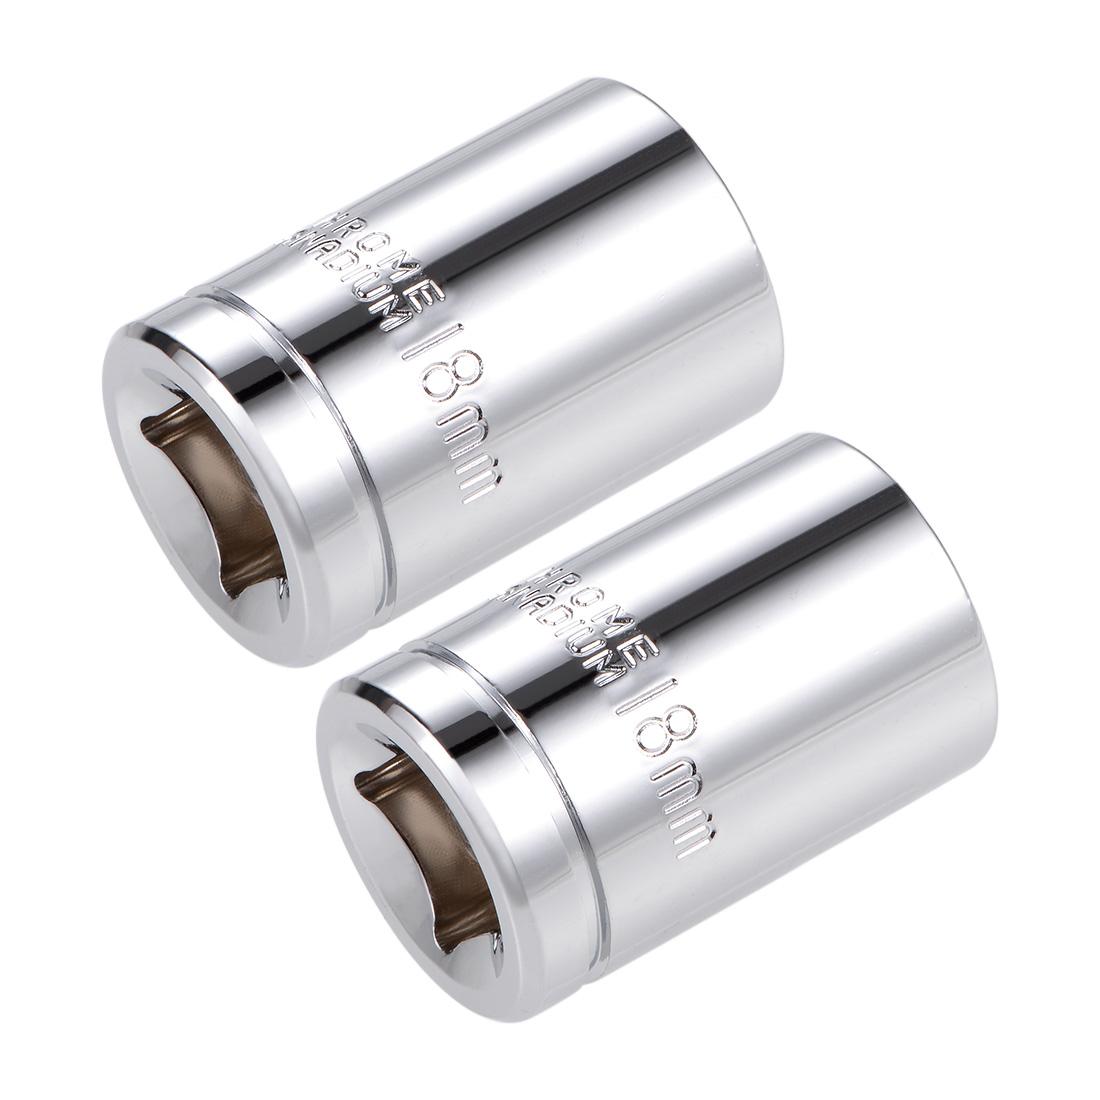 1/2-inch Drive E18 Universal Spline Socket Shallow 12 Point Cr-V Steel 2 pcs